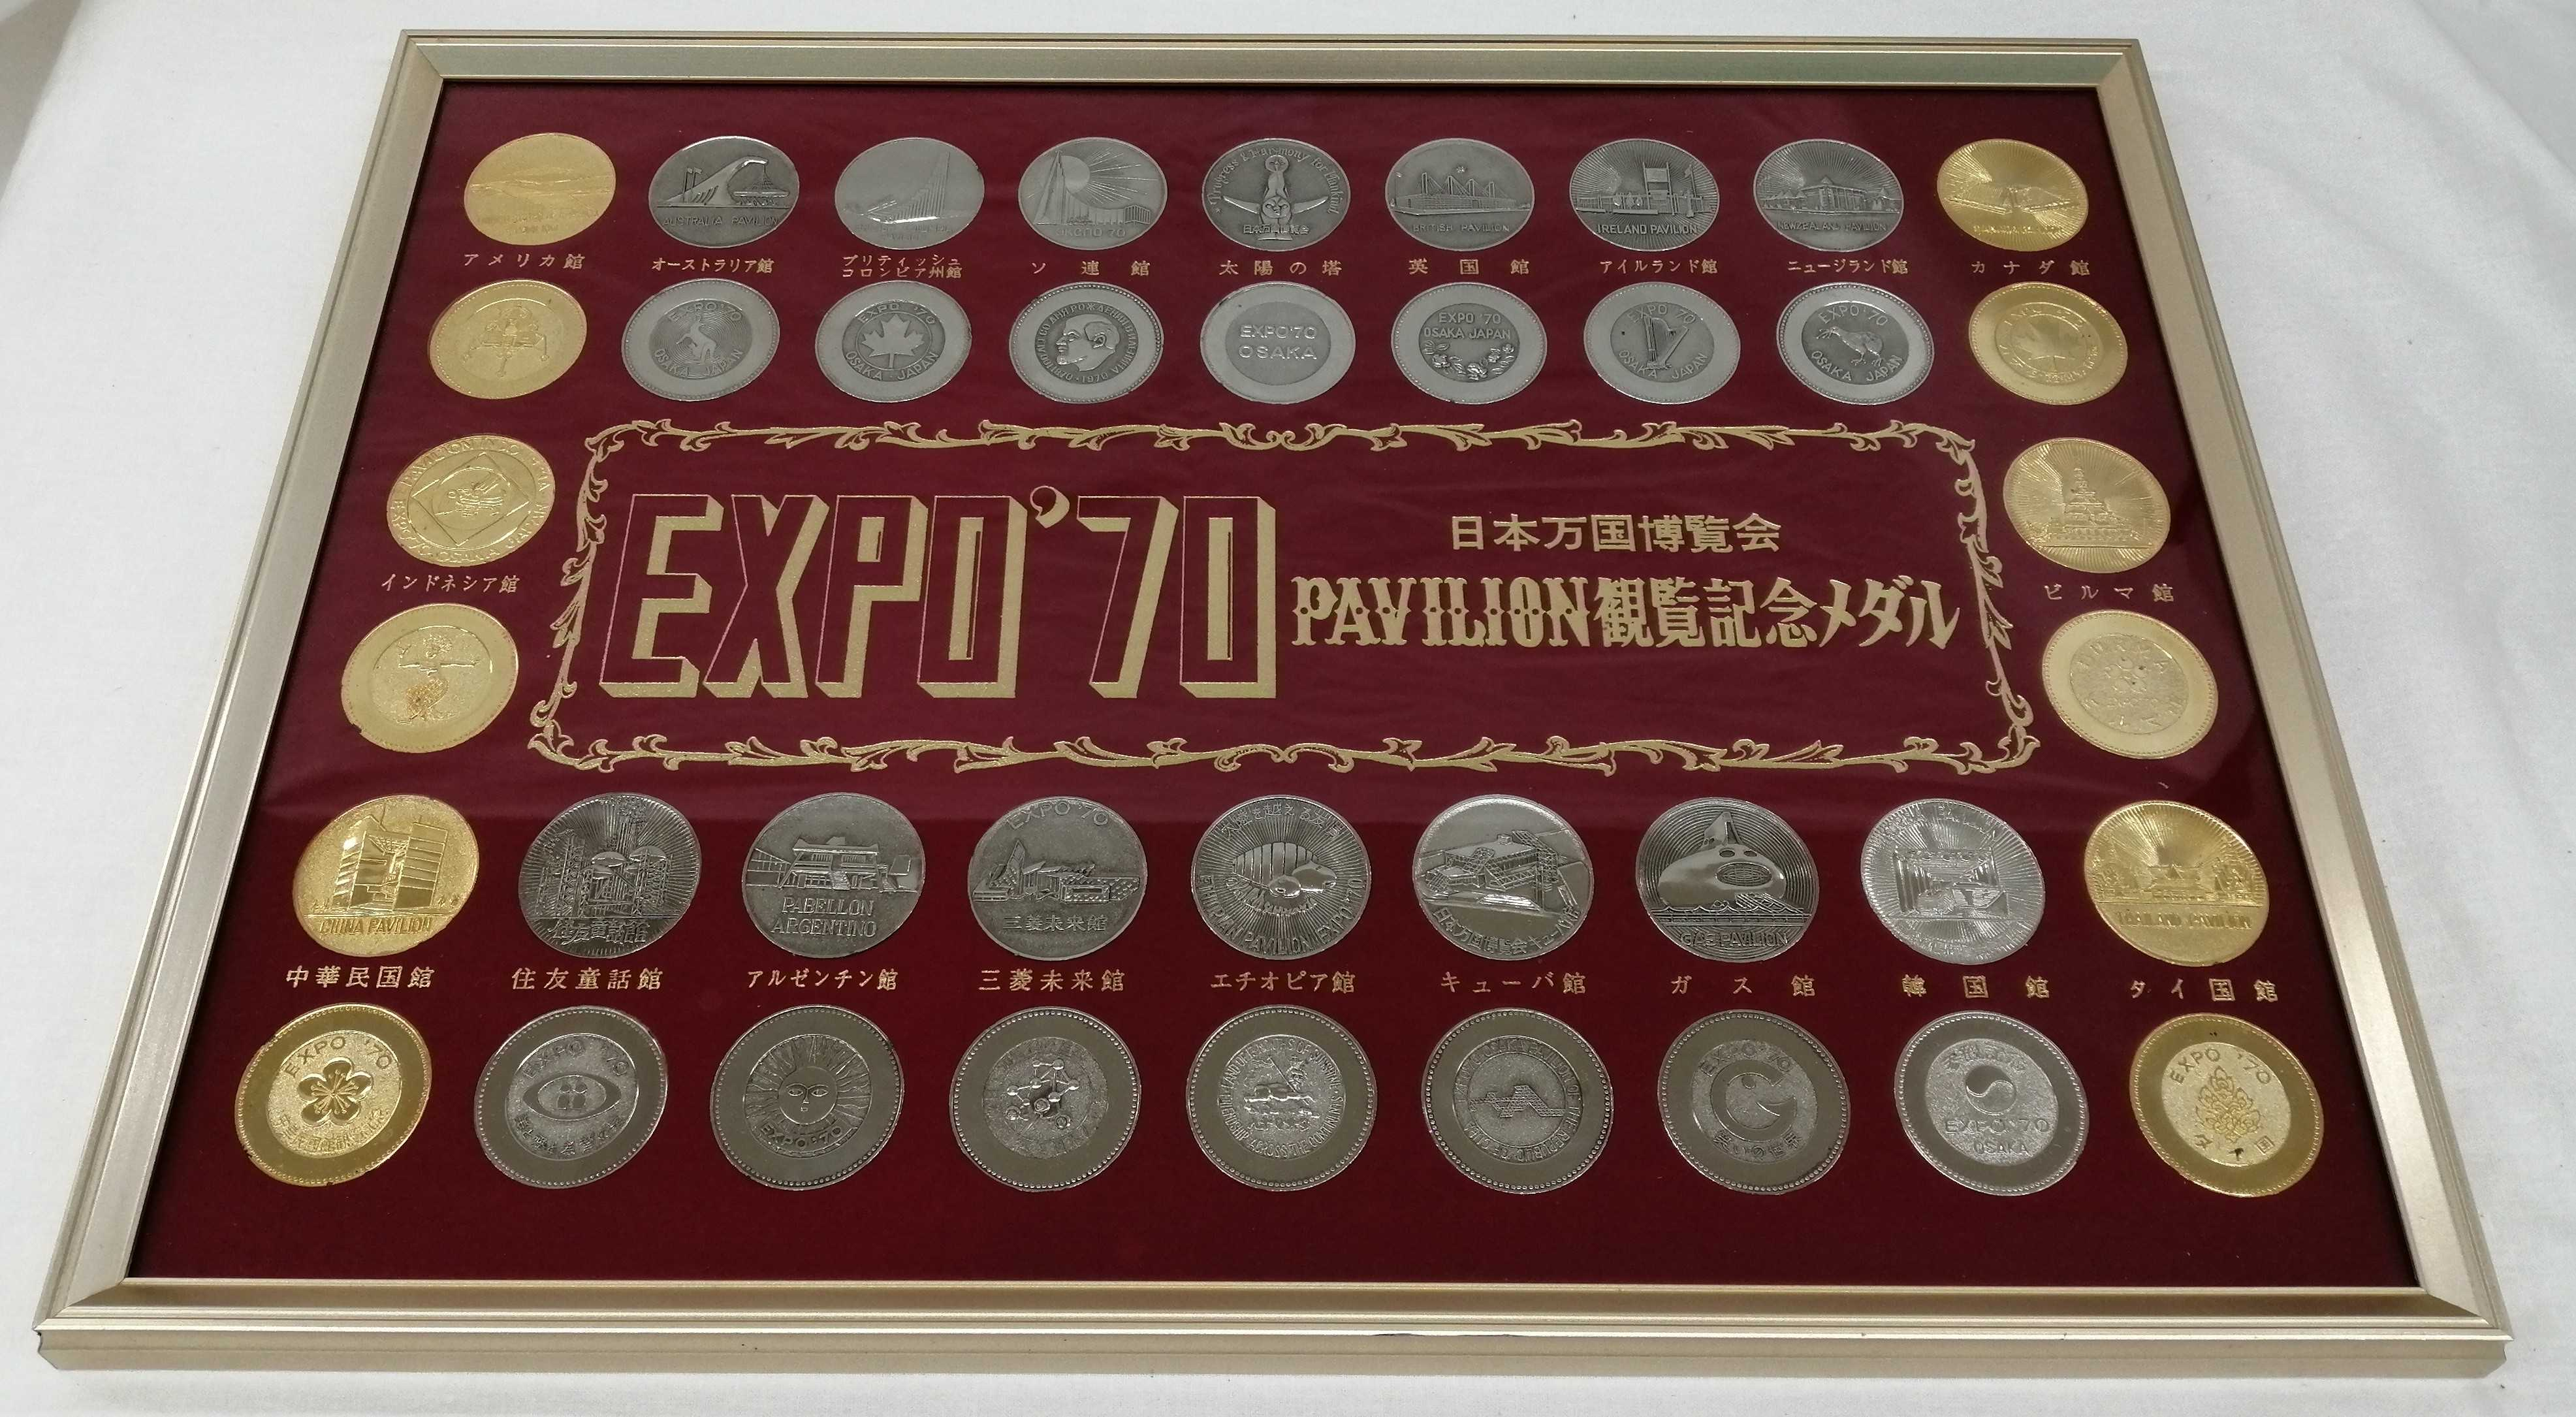 EXPO,70 PAVILION観覧記念メダル|日本メモリー株式会社